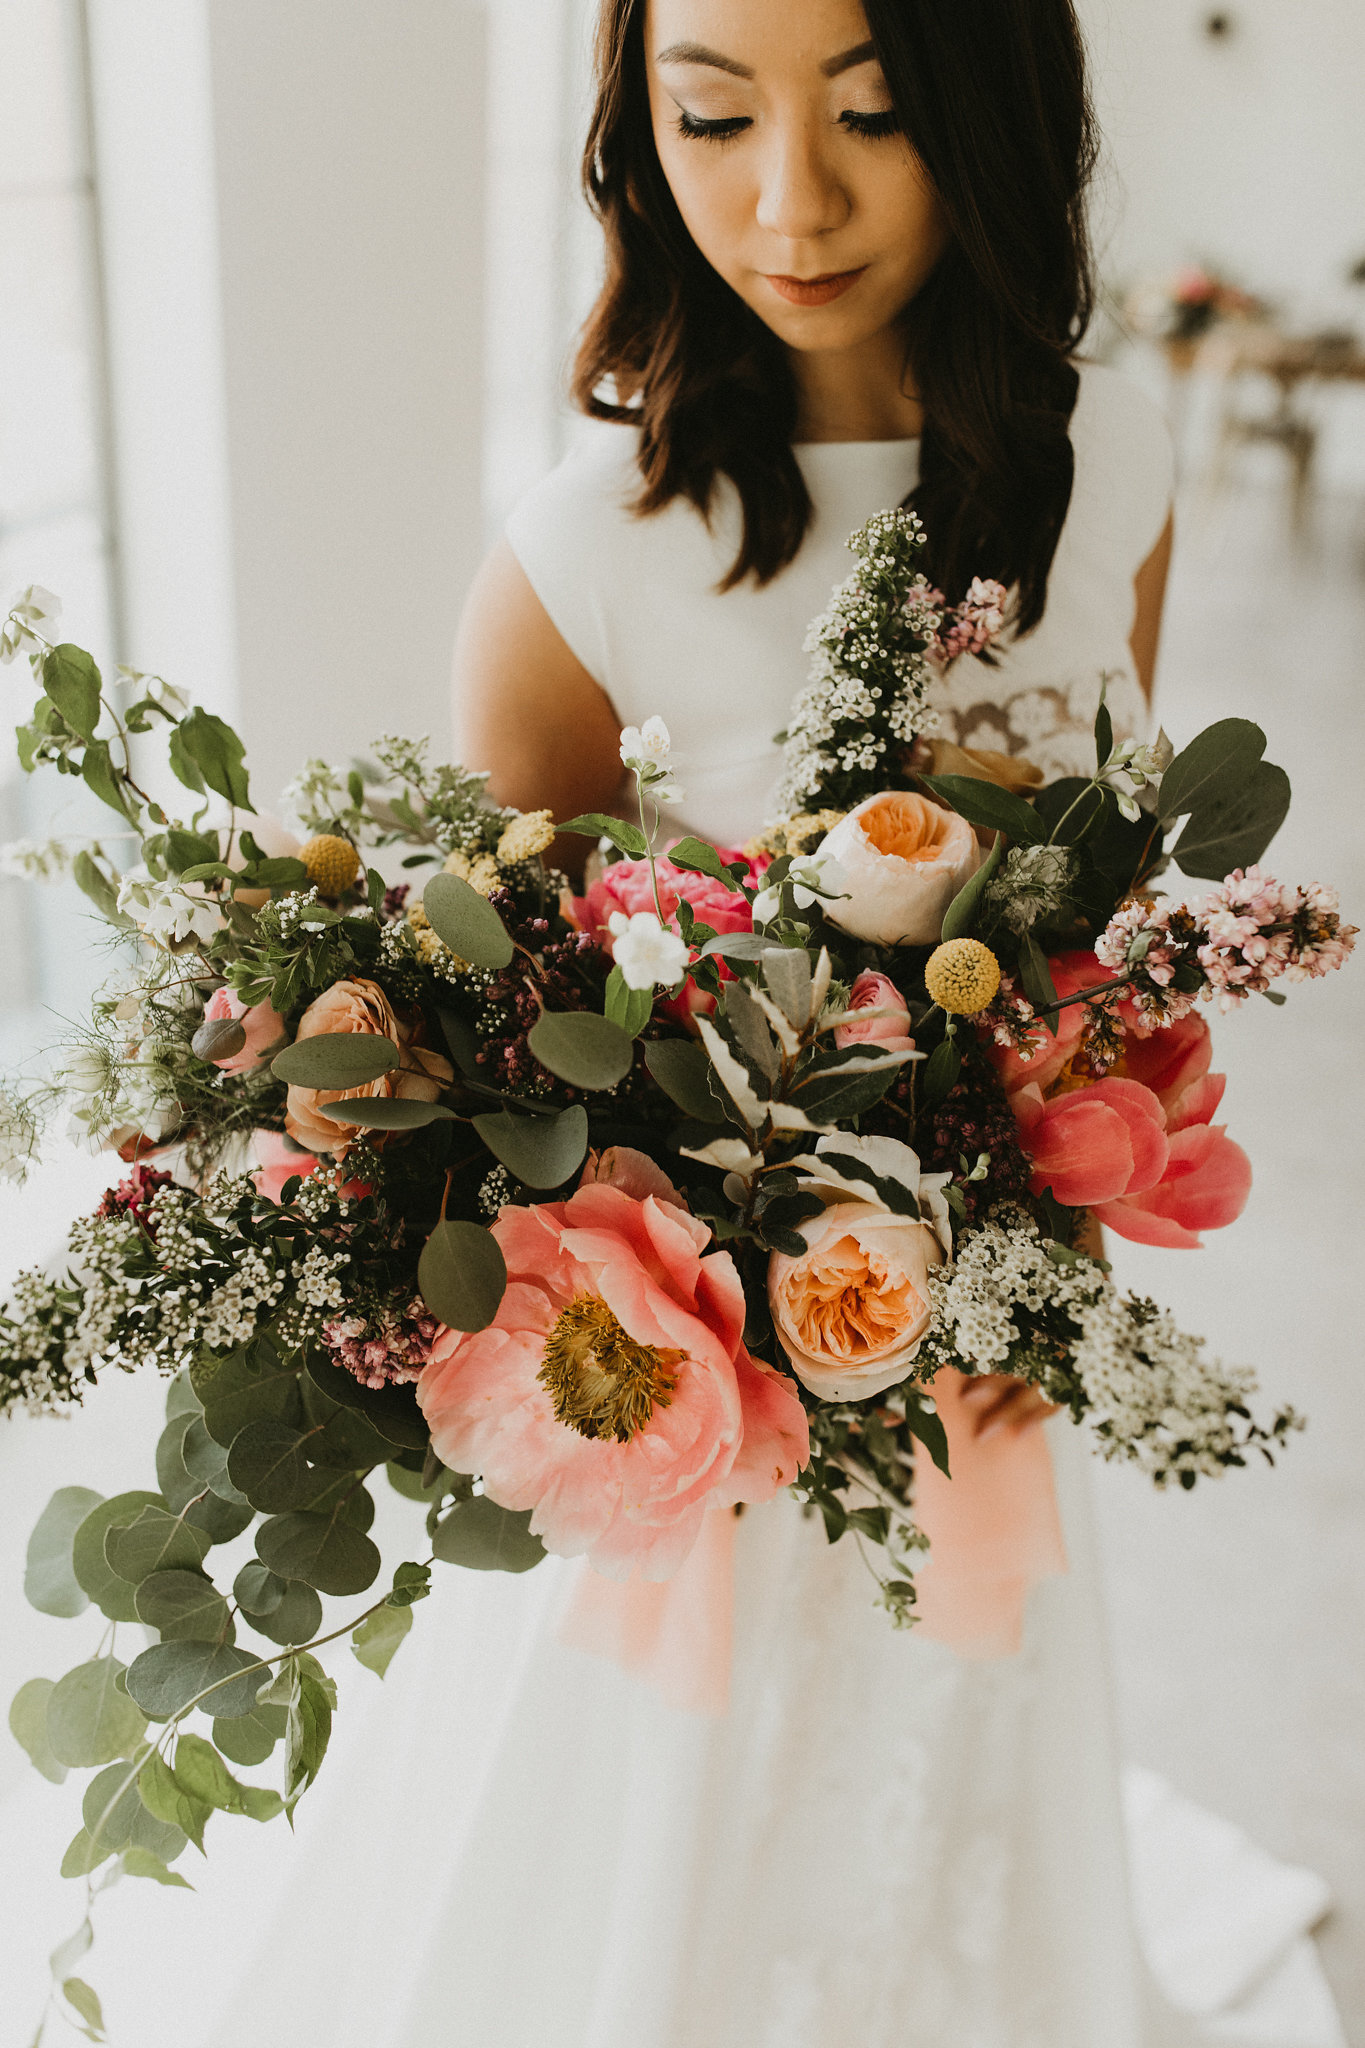 Photographer : Century Tree Productions  ||  Floral :  Urban Rubbish  ||  Venue : The Meekermark, Magnolia, Texas